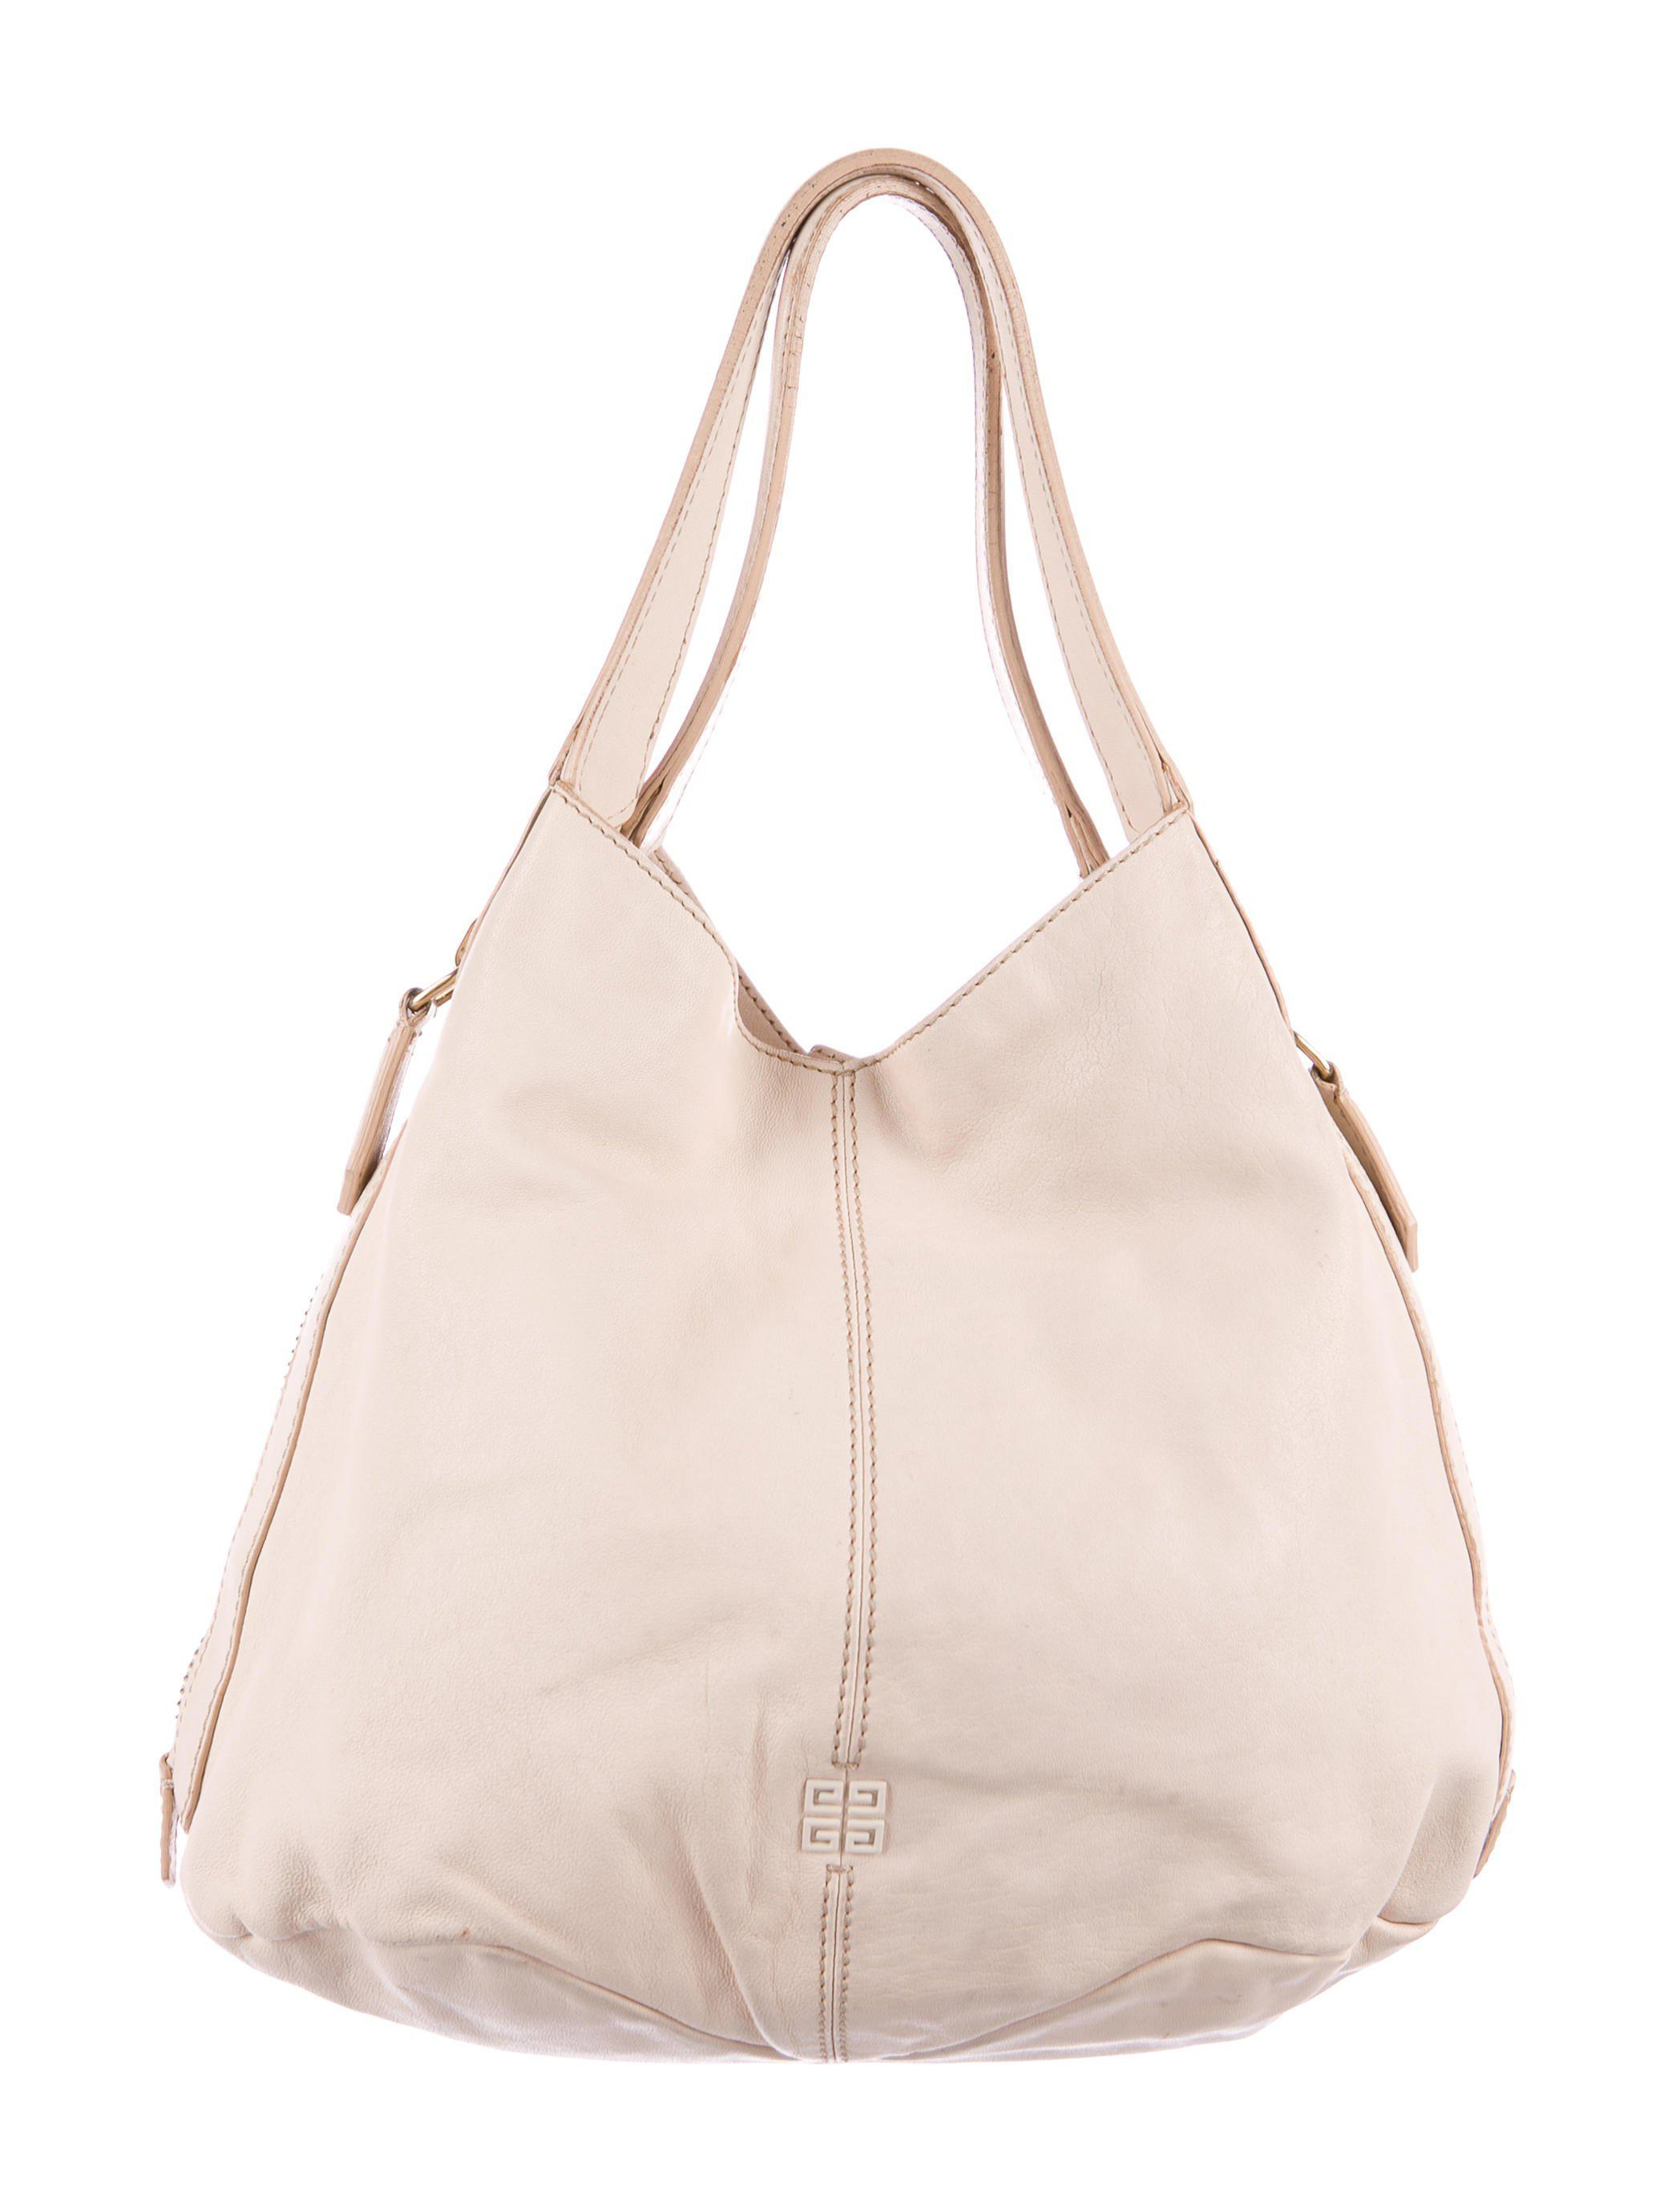 e5b0abbd9895 Lyst - Givenchy Tinhan Shopper Bag Gold in Metallic